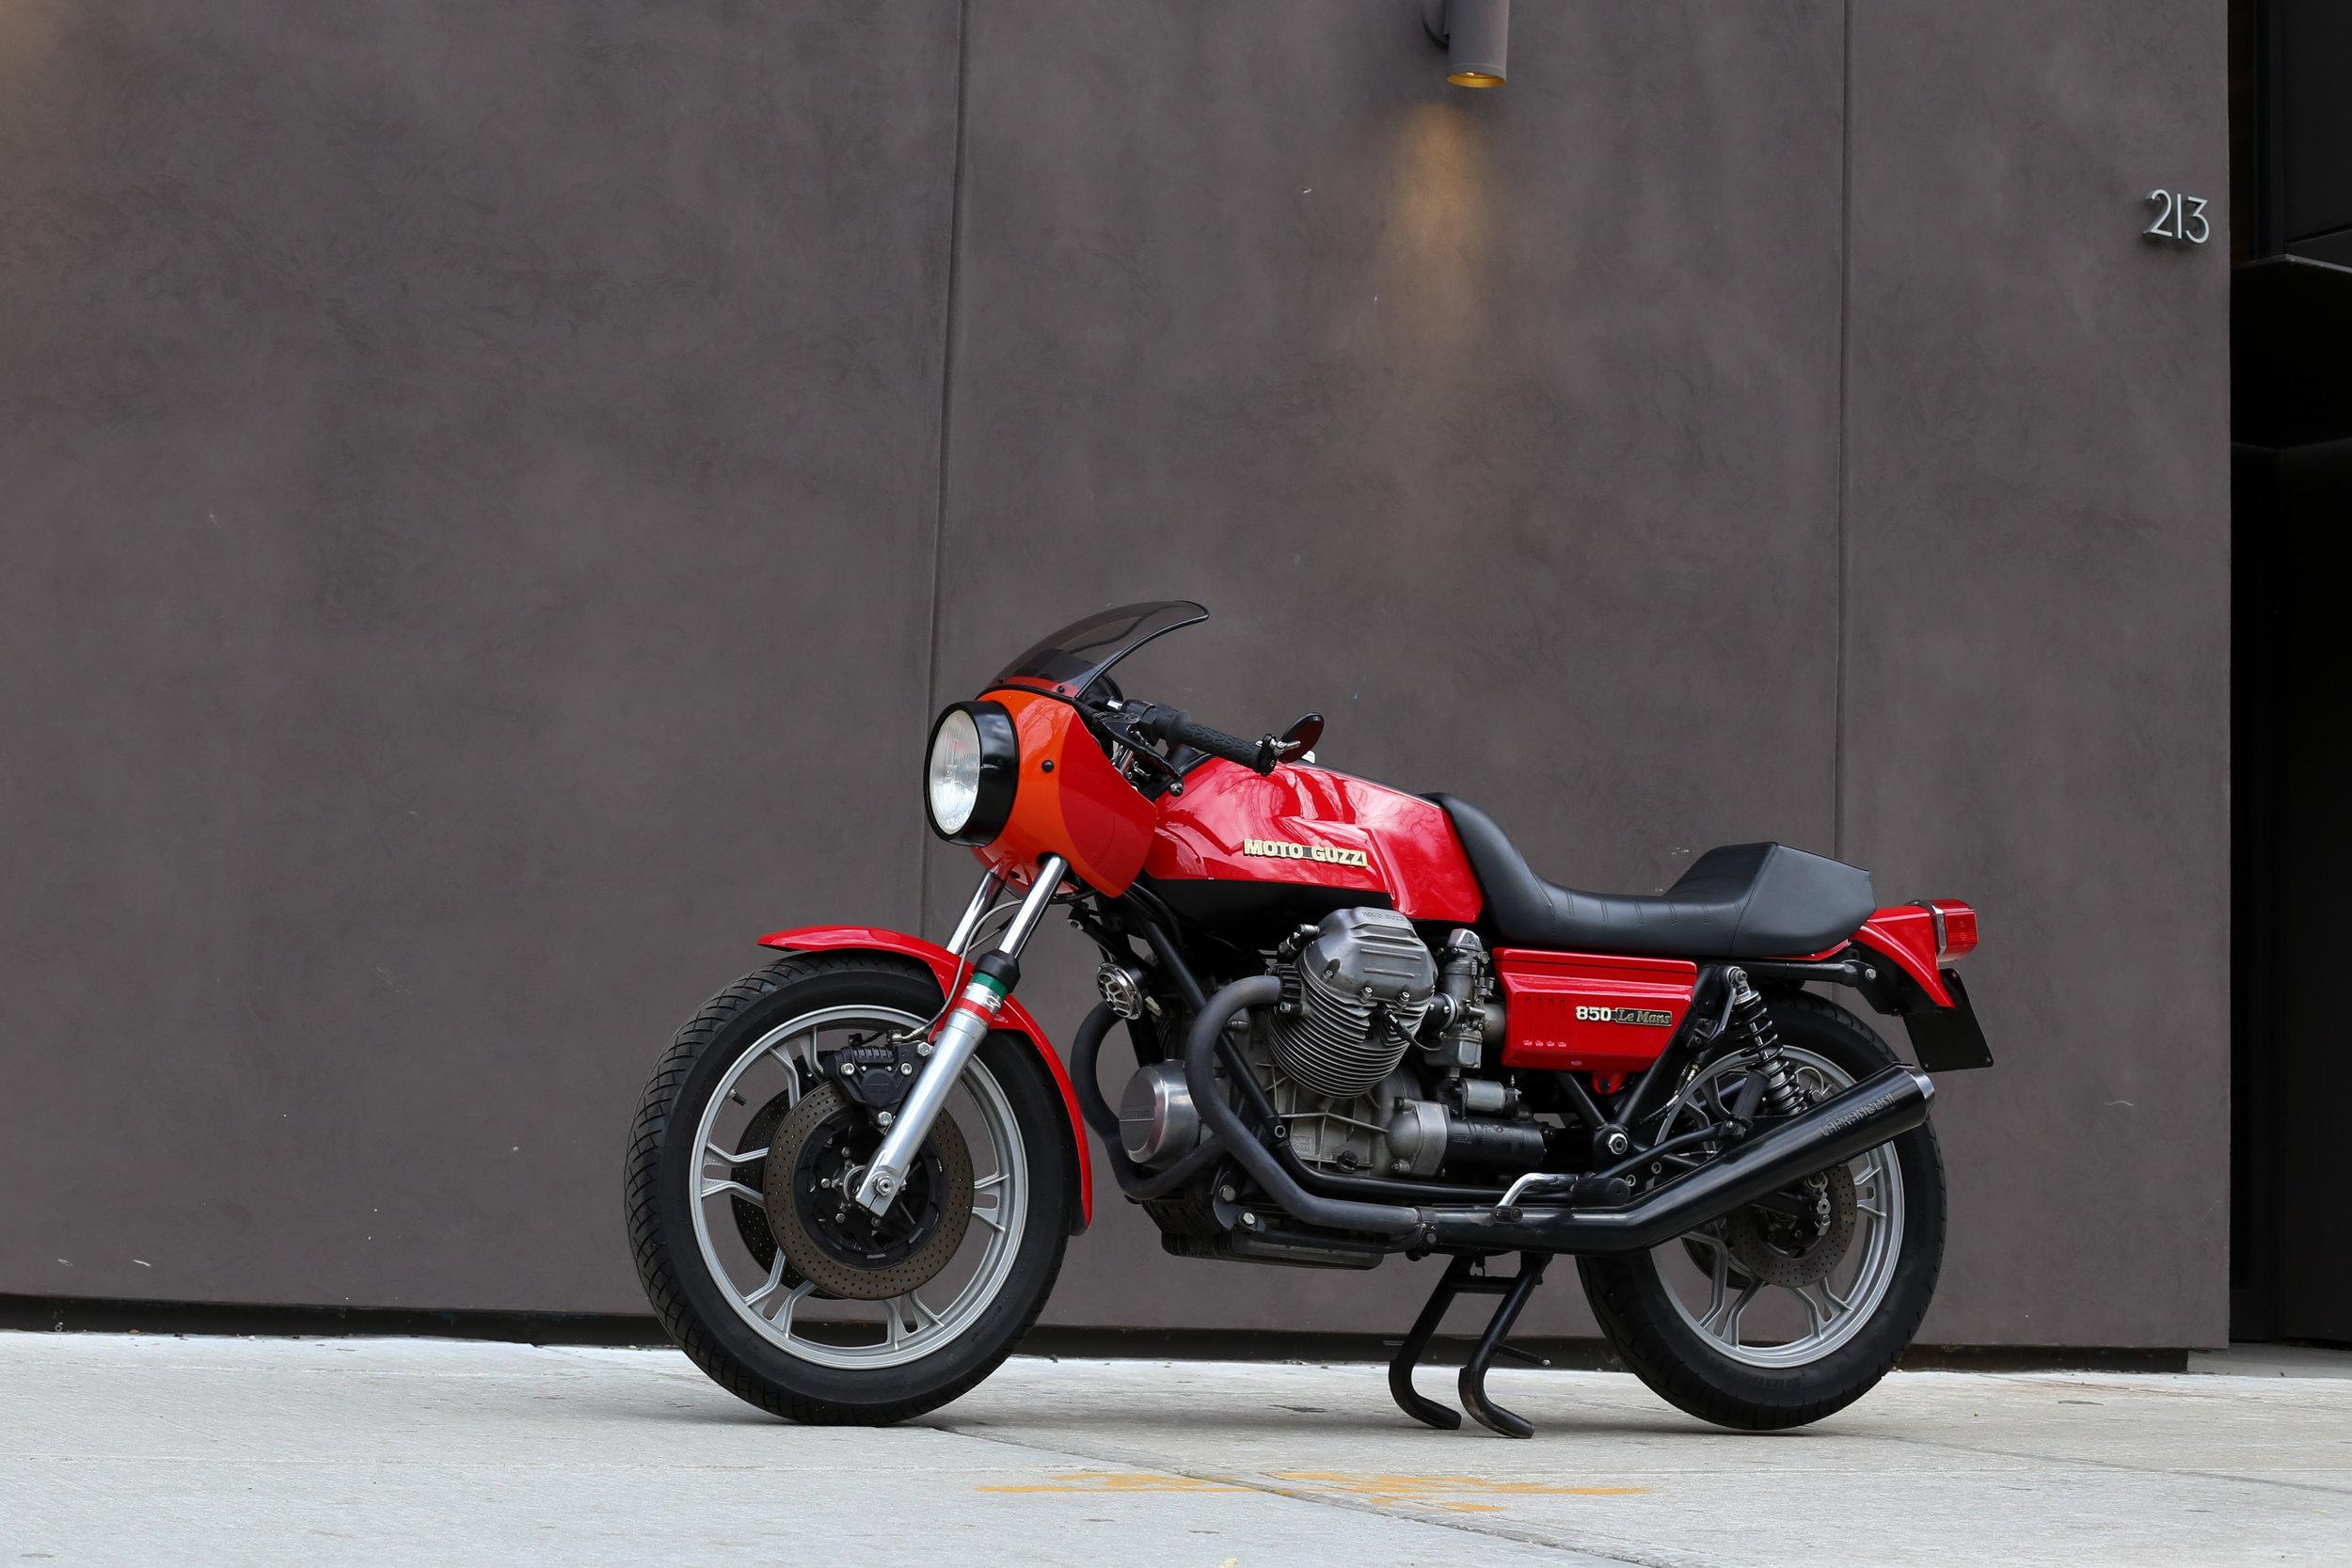 1976 Moto Guzzi 850 Lemans 1 Sold Motorcycles